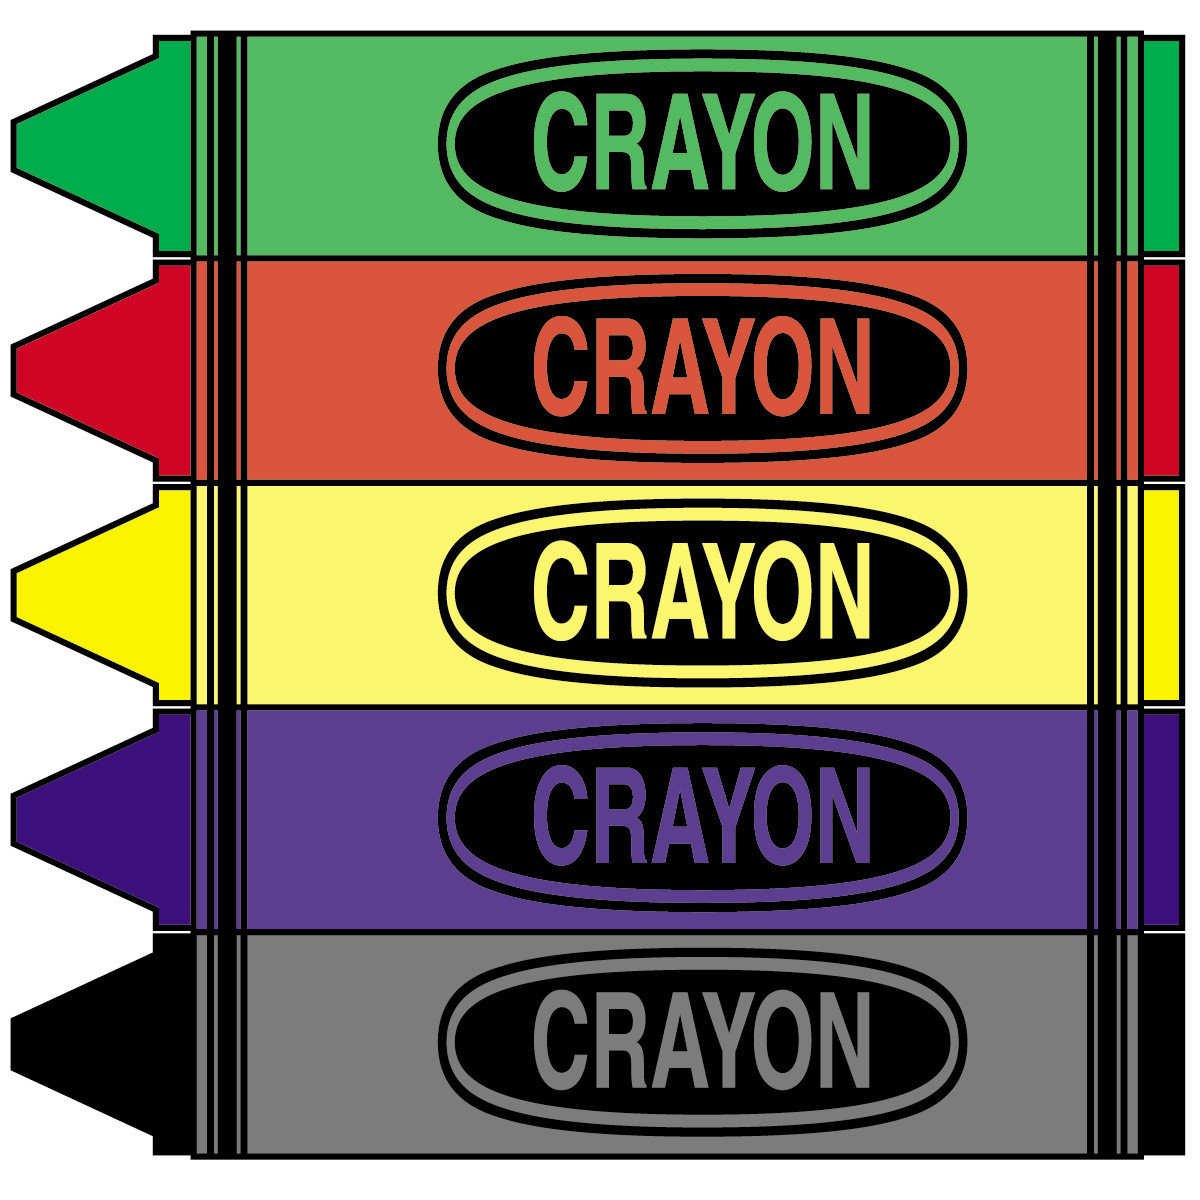 1200x1200 Crayola Crayons Clipart Panda Free Images Mesmerizing Crayon Clip